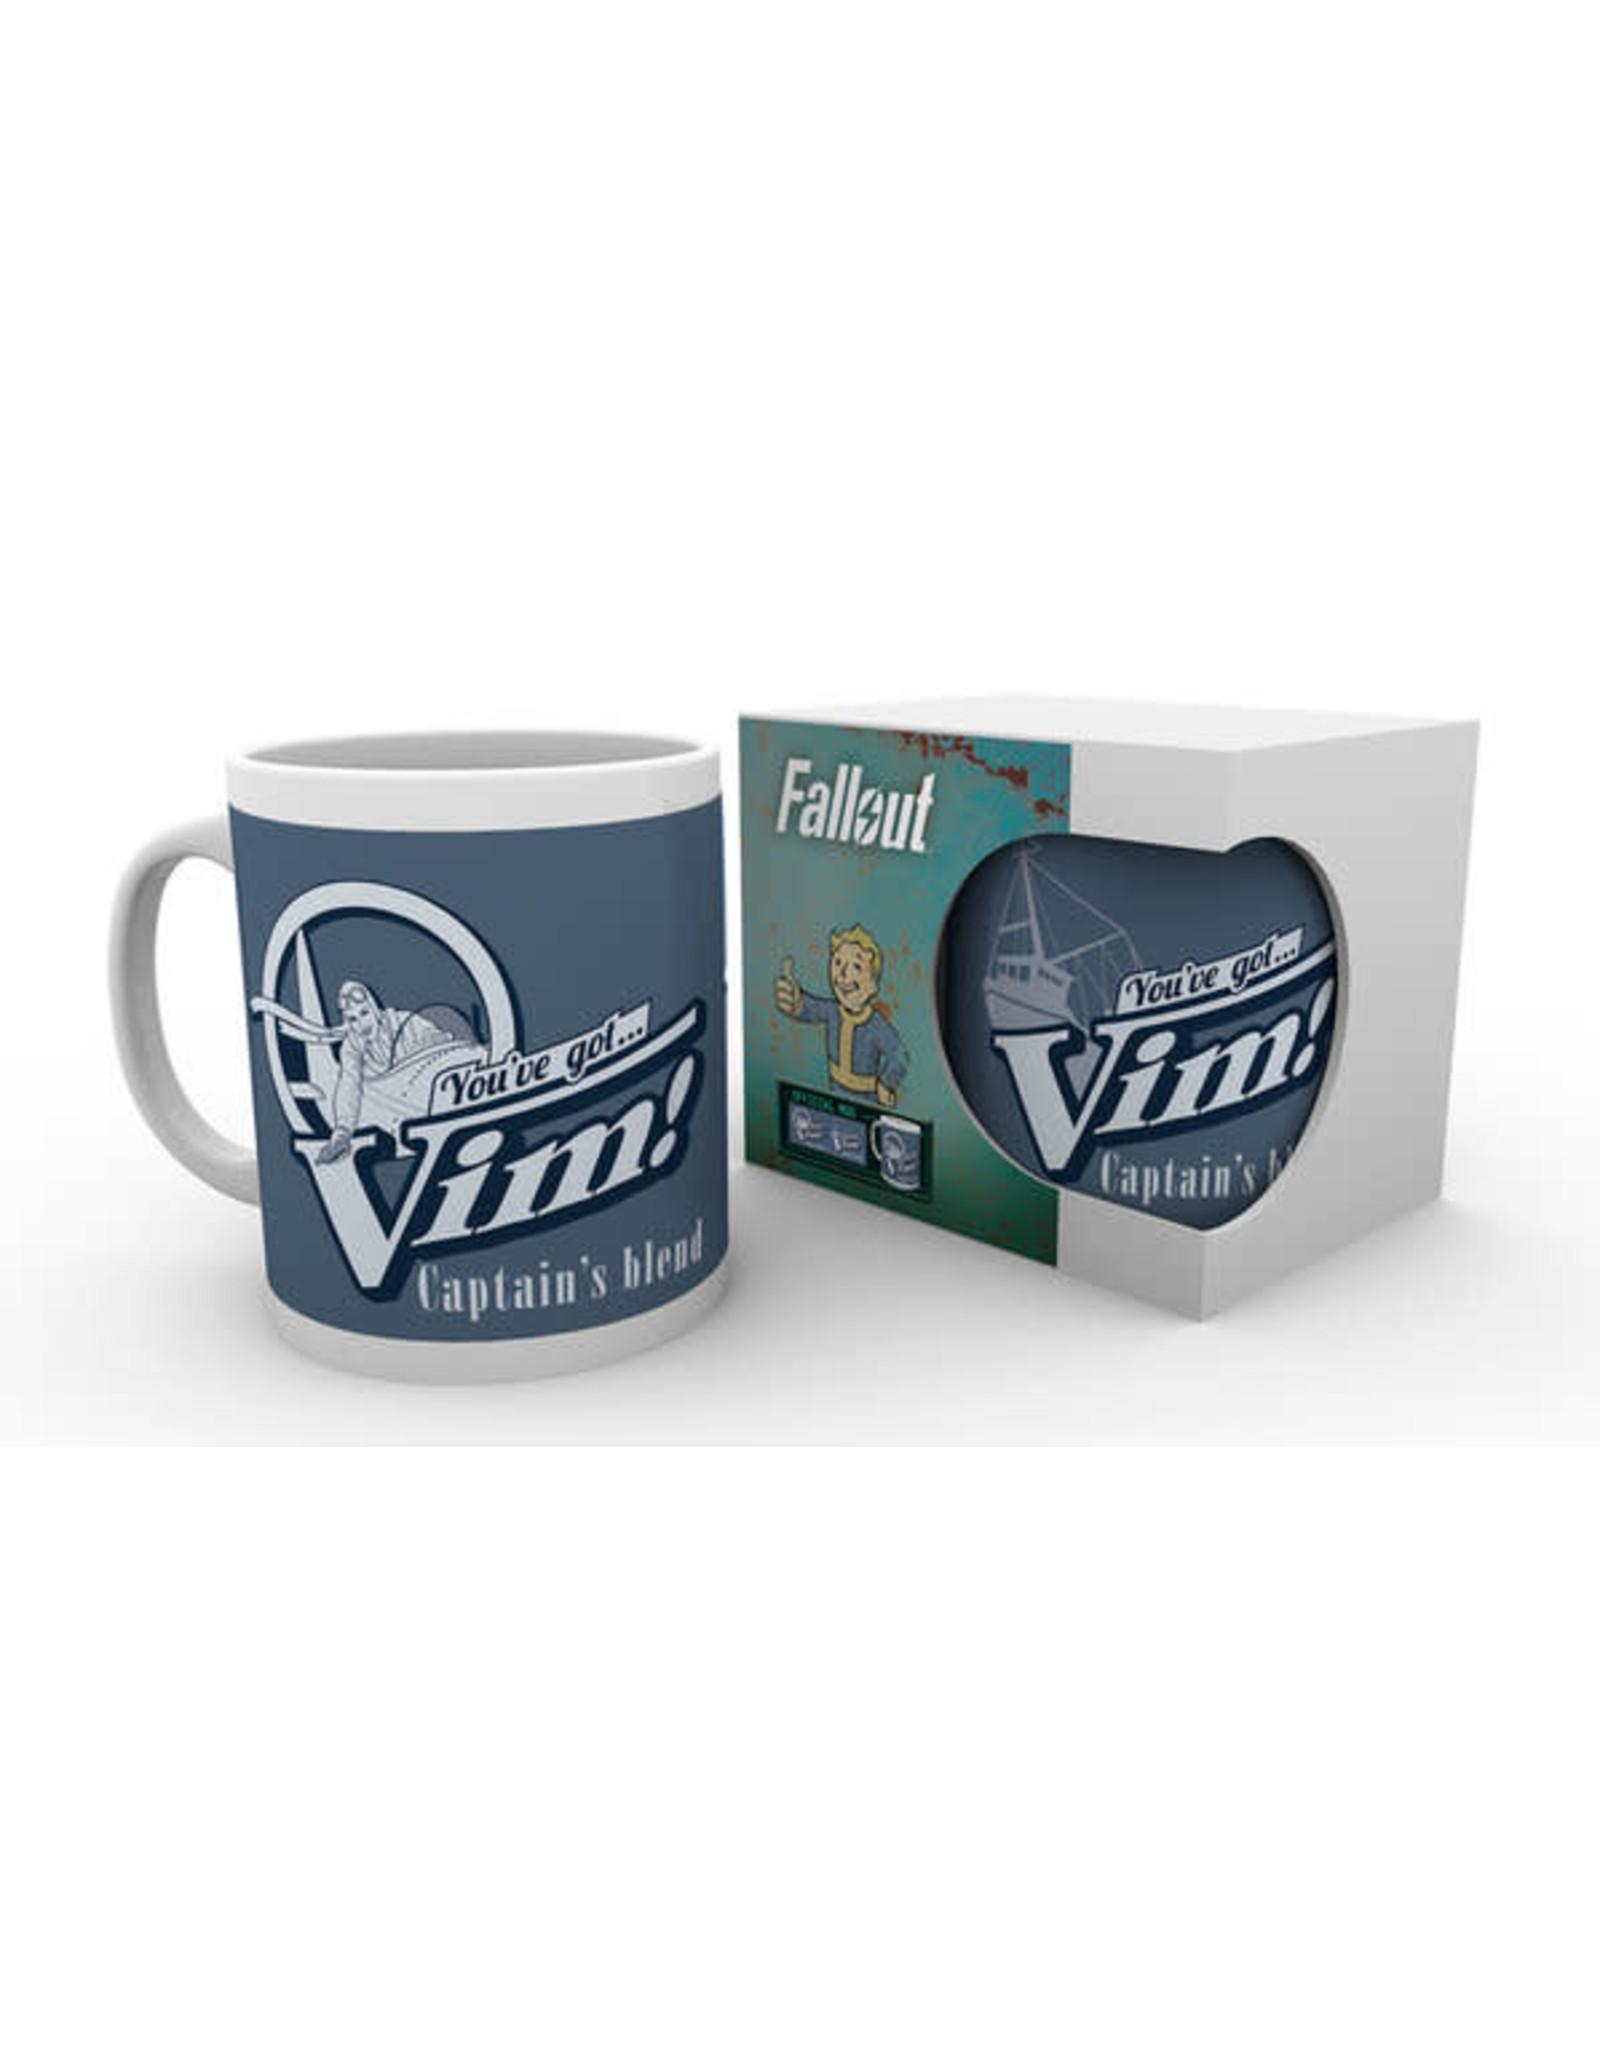 FALLOUT 4 Mug 300 ml - Captain's Blend